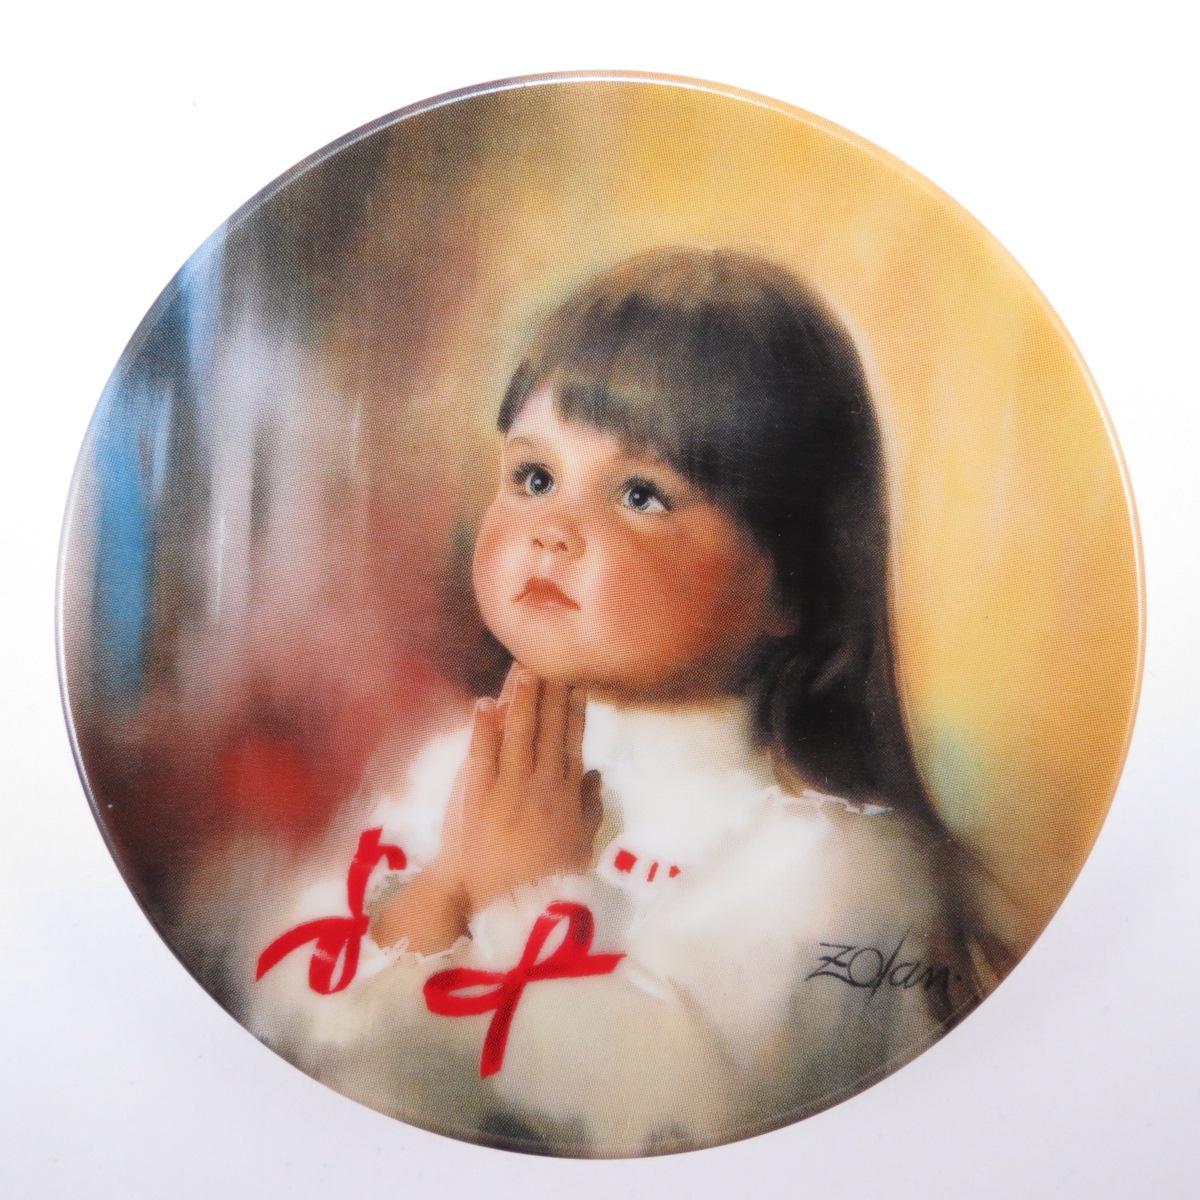 Декоративная тарелка Pemberton & Oakes Любимый детский художник Америки, 91451273